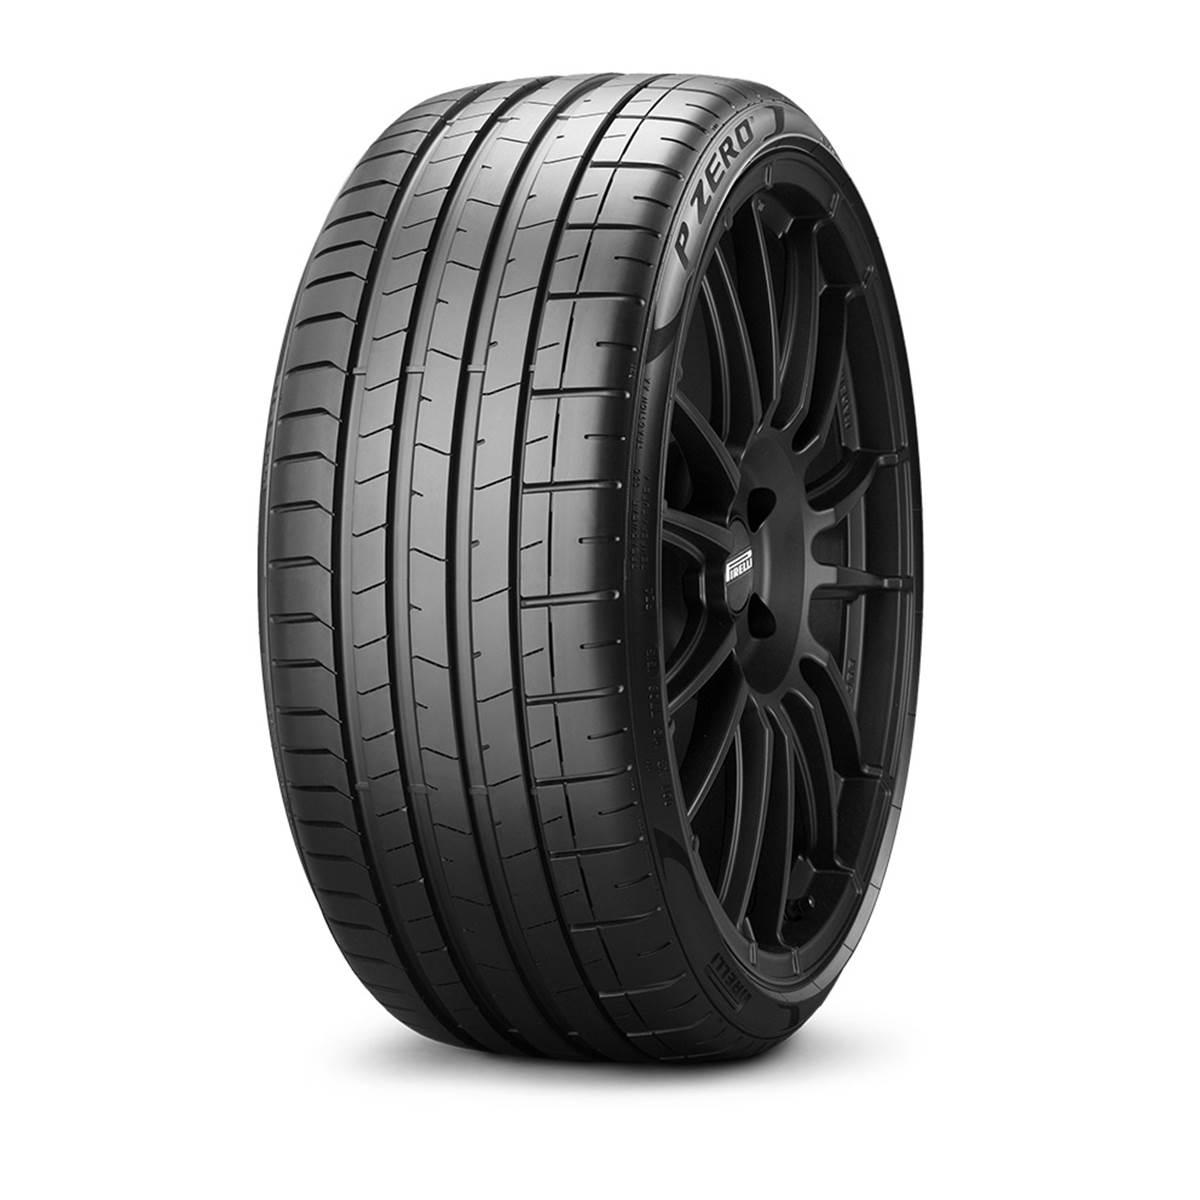 Pneu Pirelli 225/40R18 92Y P-Zero XL